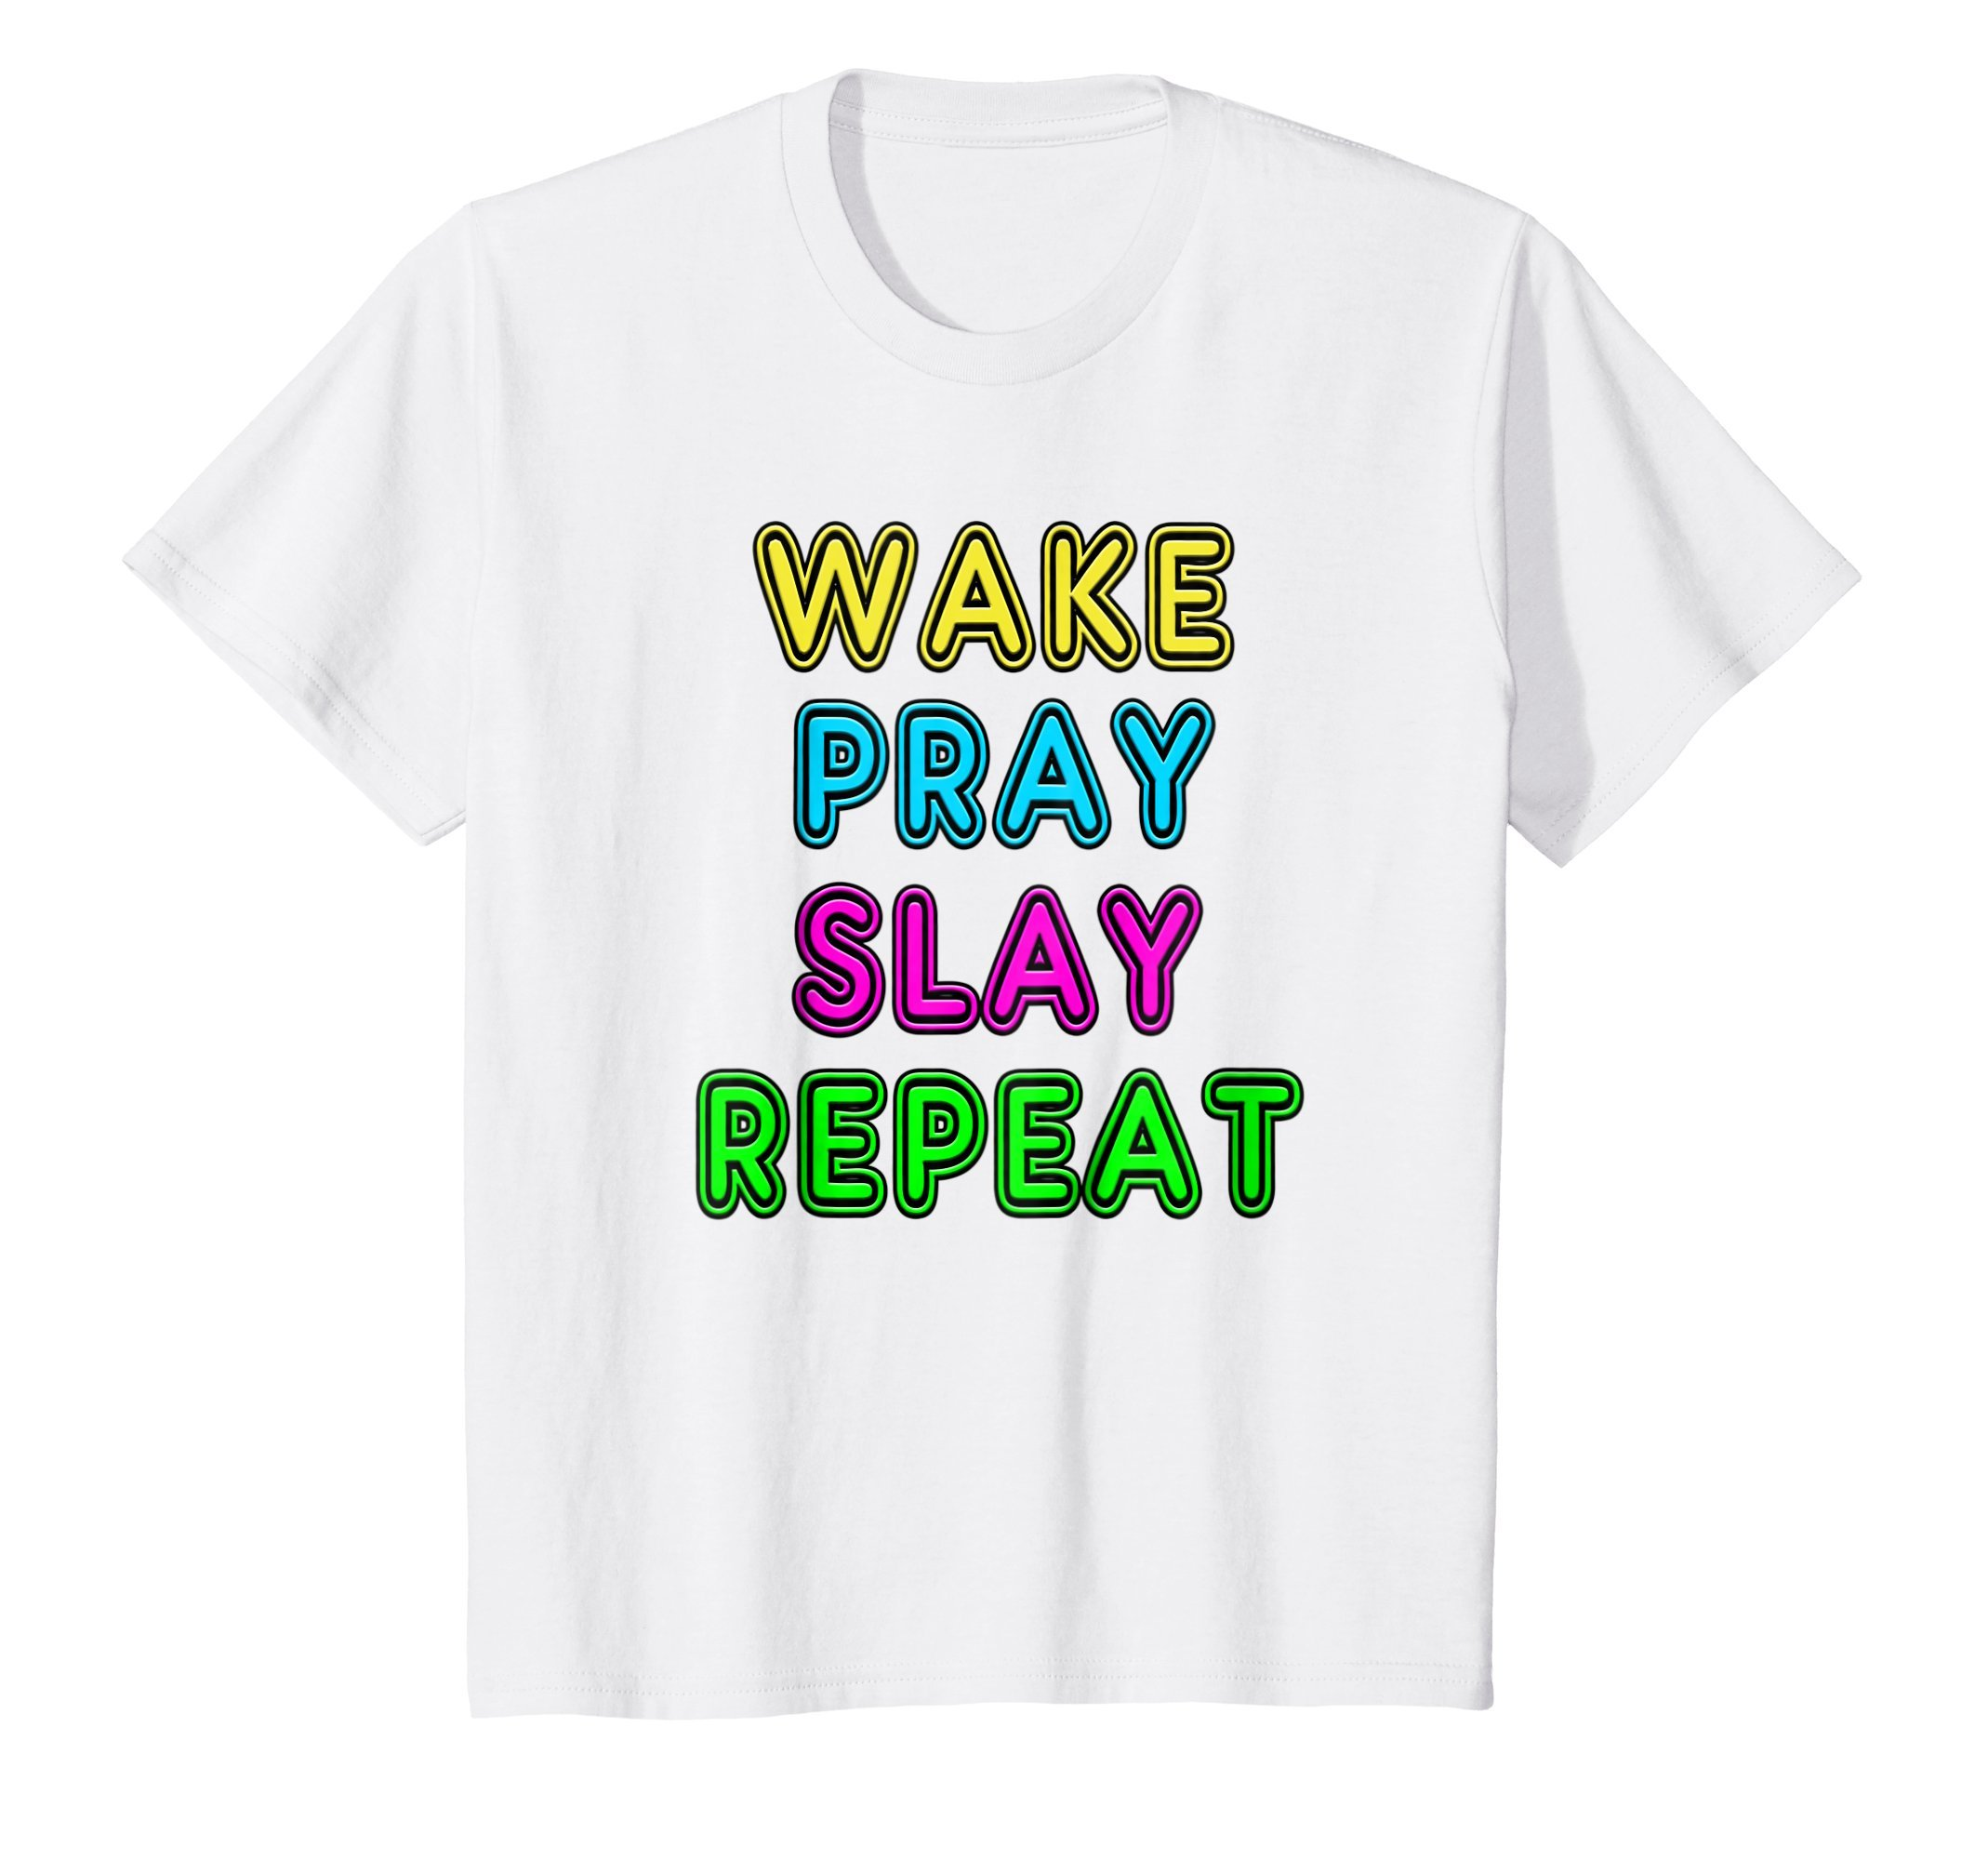 Kids Retro 80's Vintage Neon Sign Wake Pray Slay Repeat T-Shirt 10 White